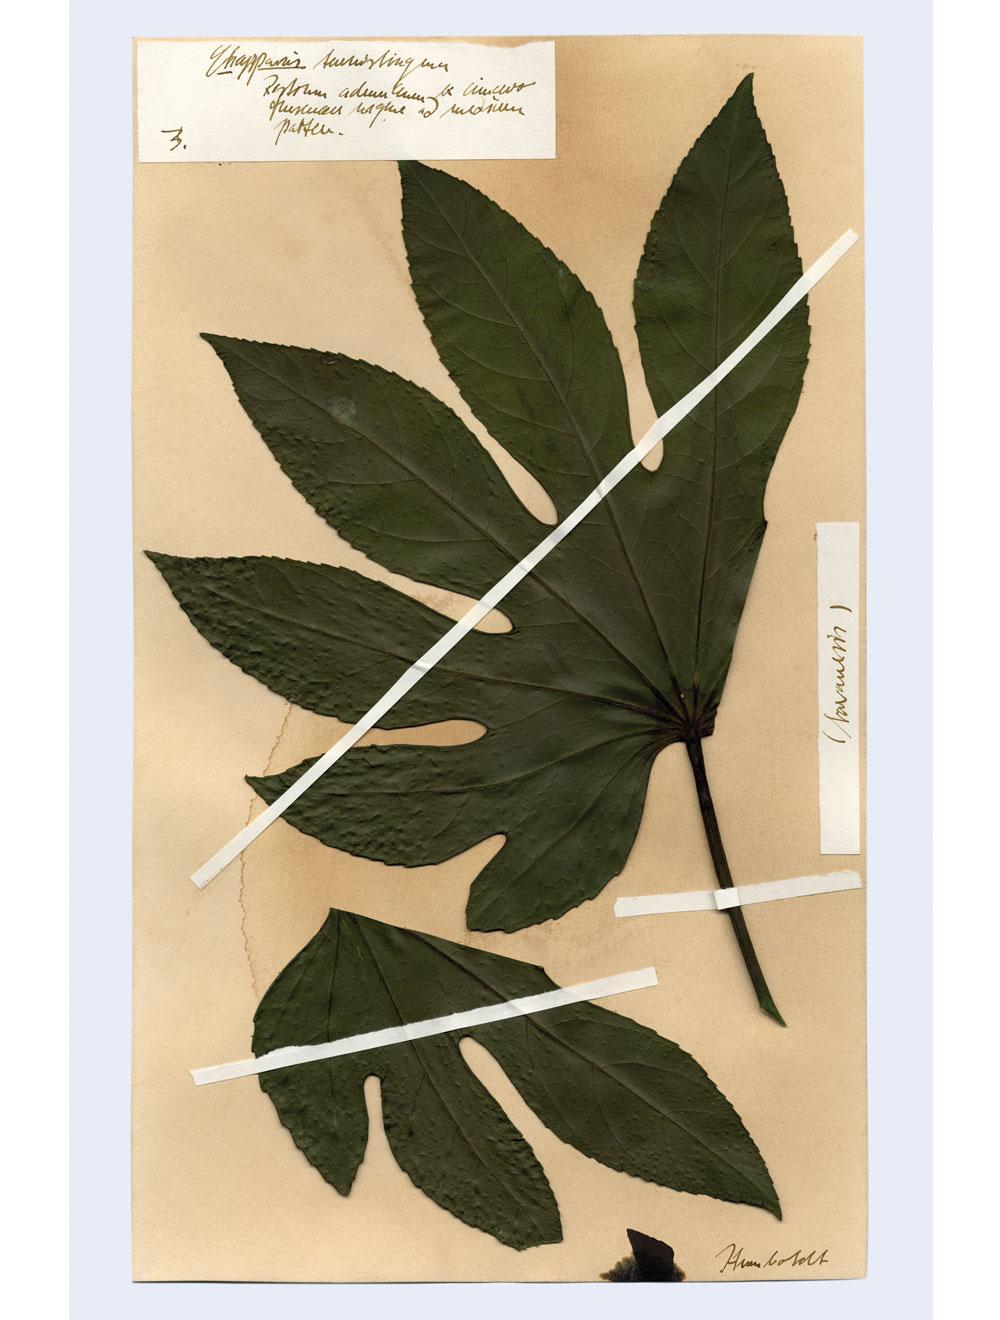 Spezialrequisite // Herbariumsblätter Humboldt (um 1850)